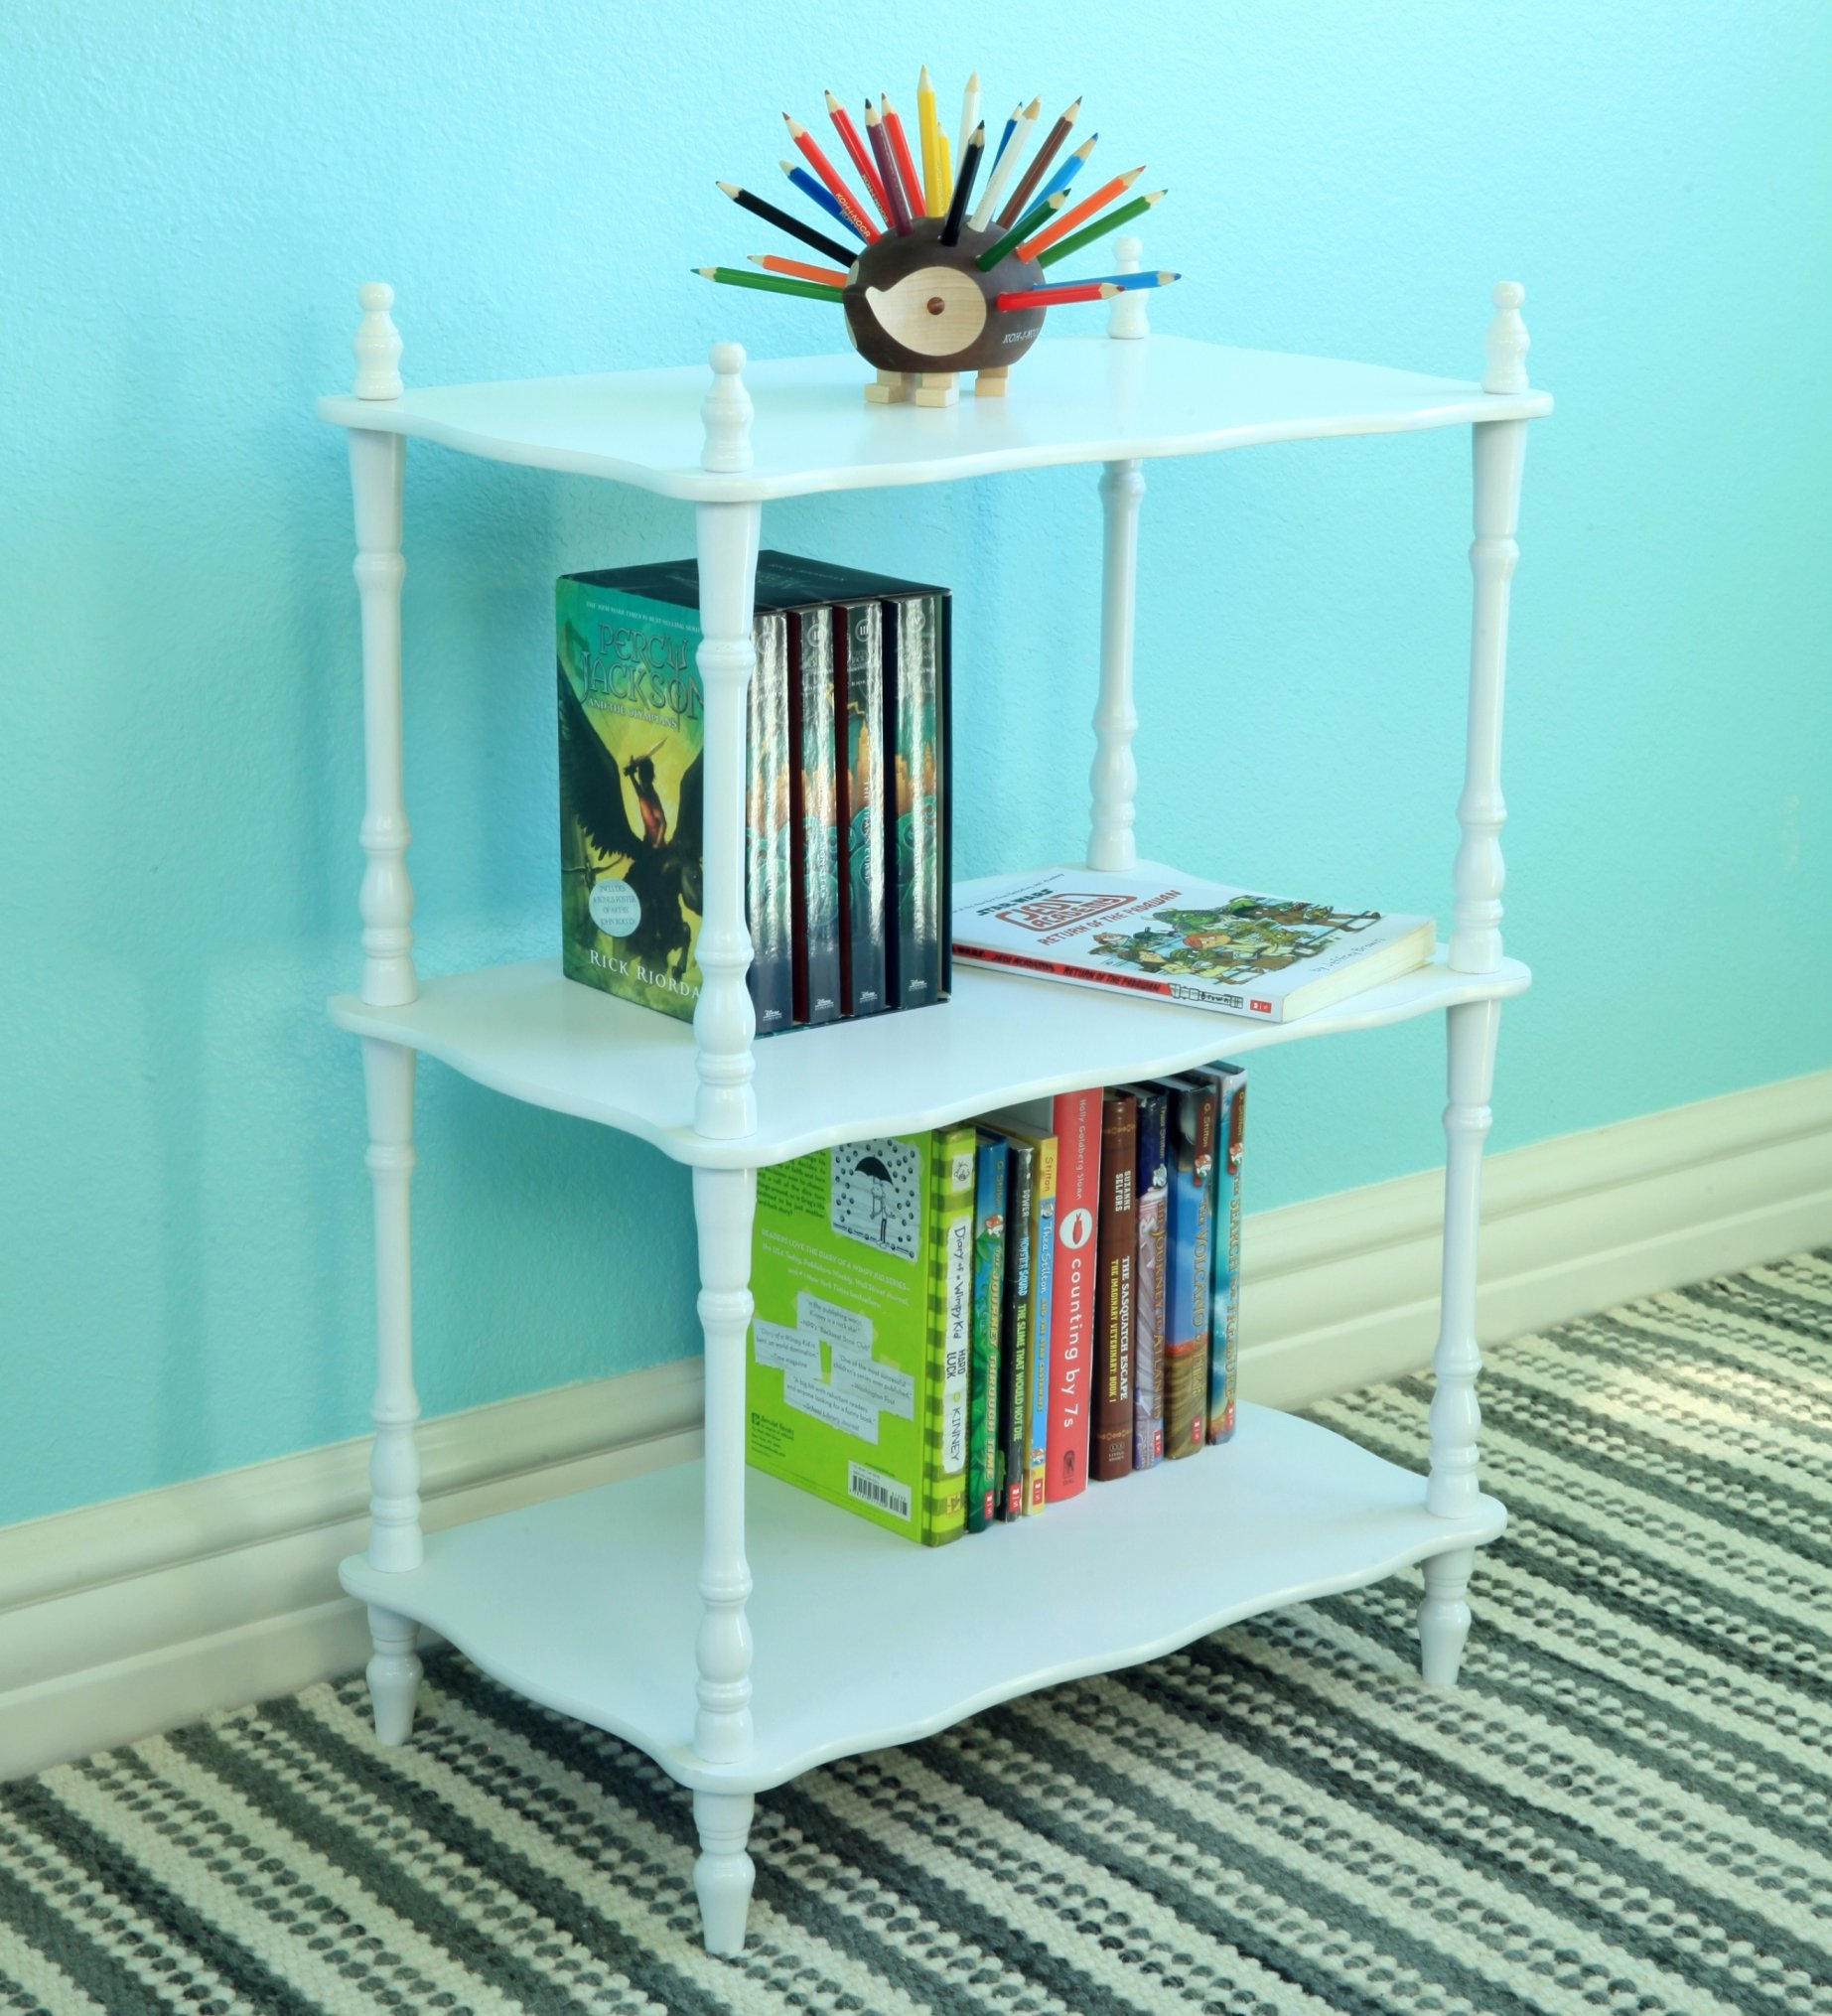 Frenchi Home Furnishing Kid's 3-Tier Shelves, White